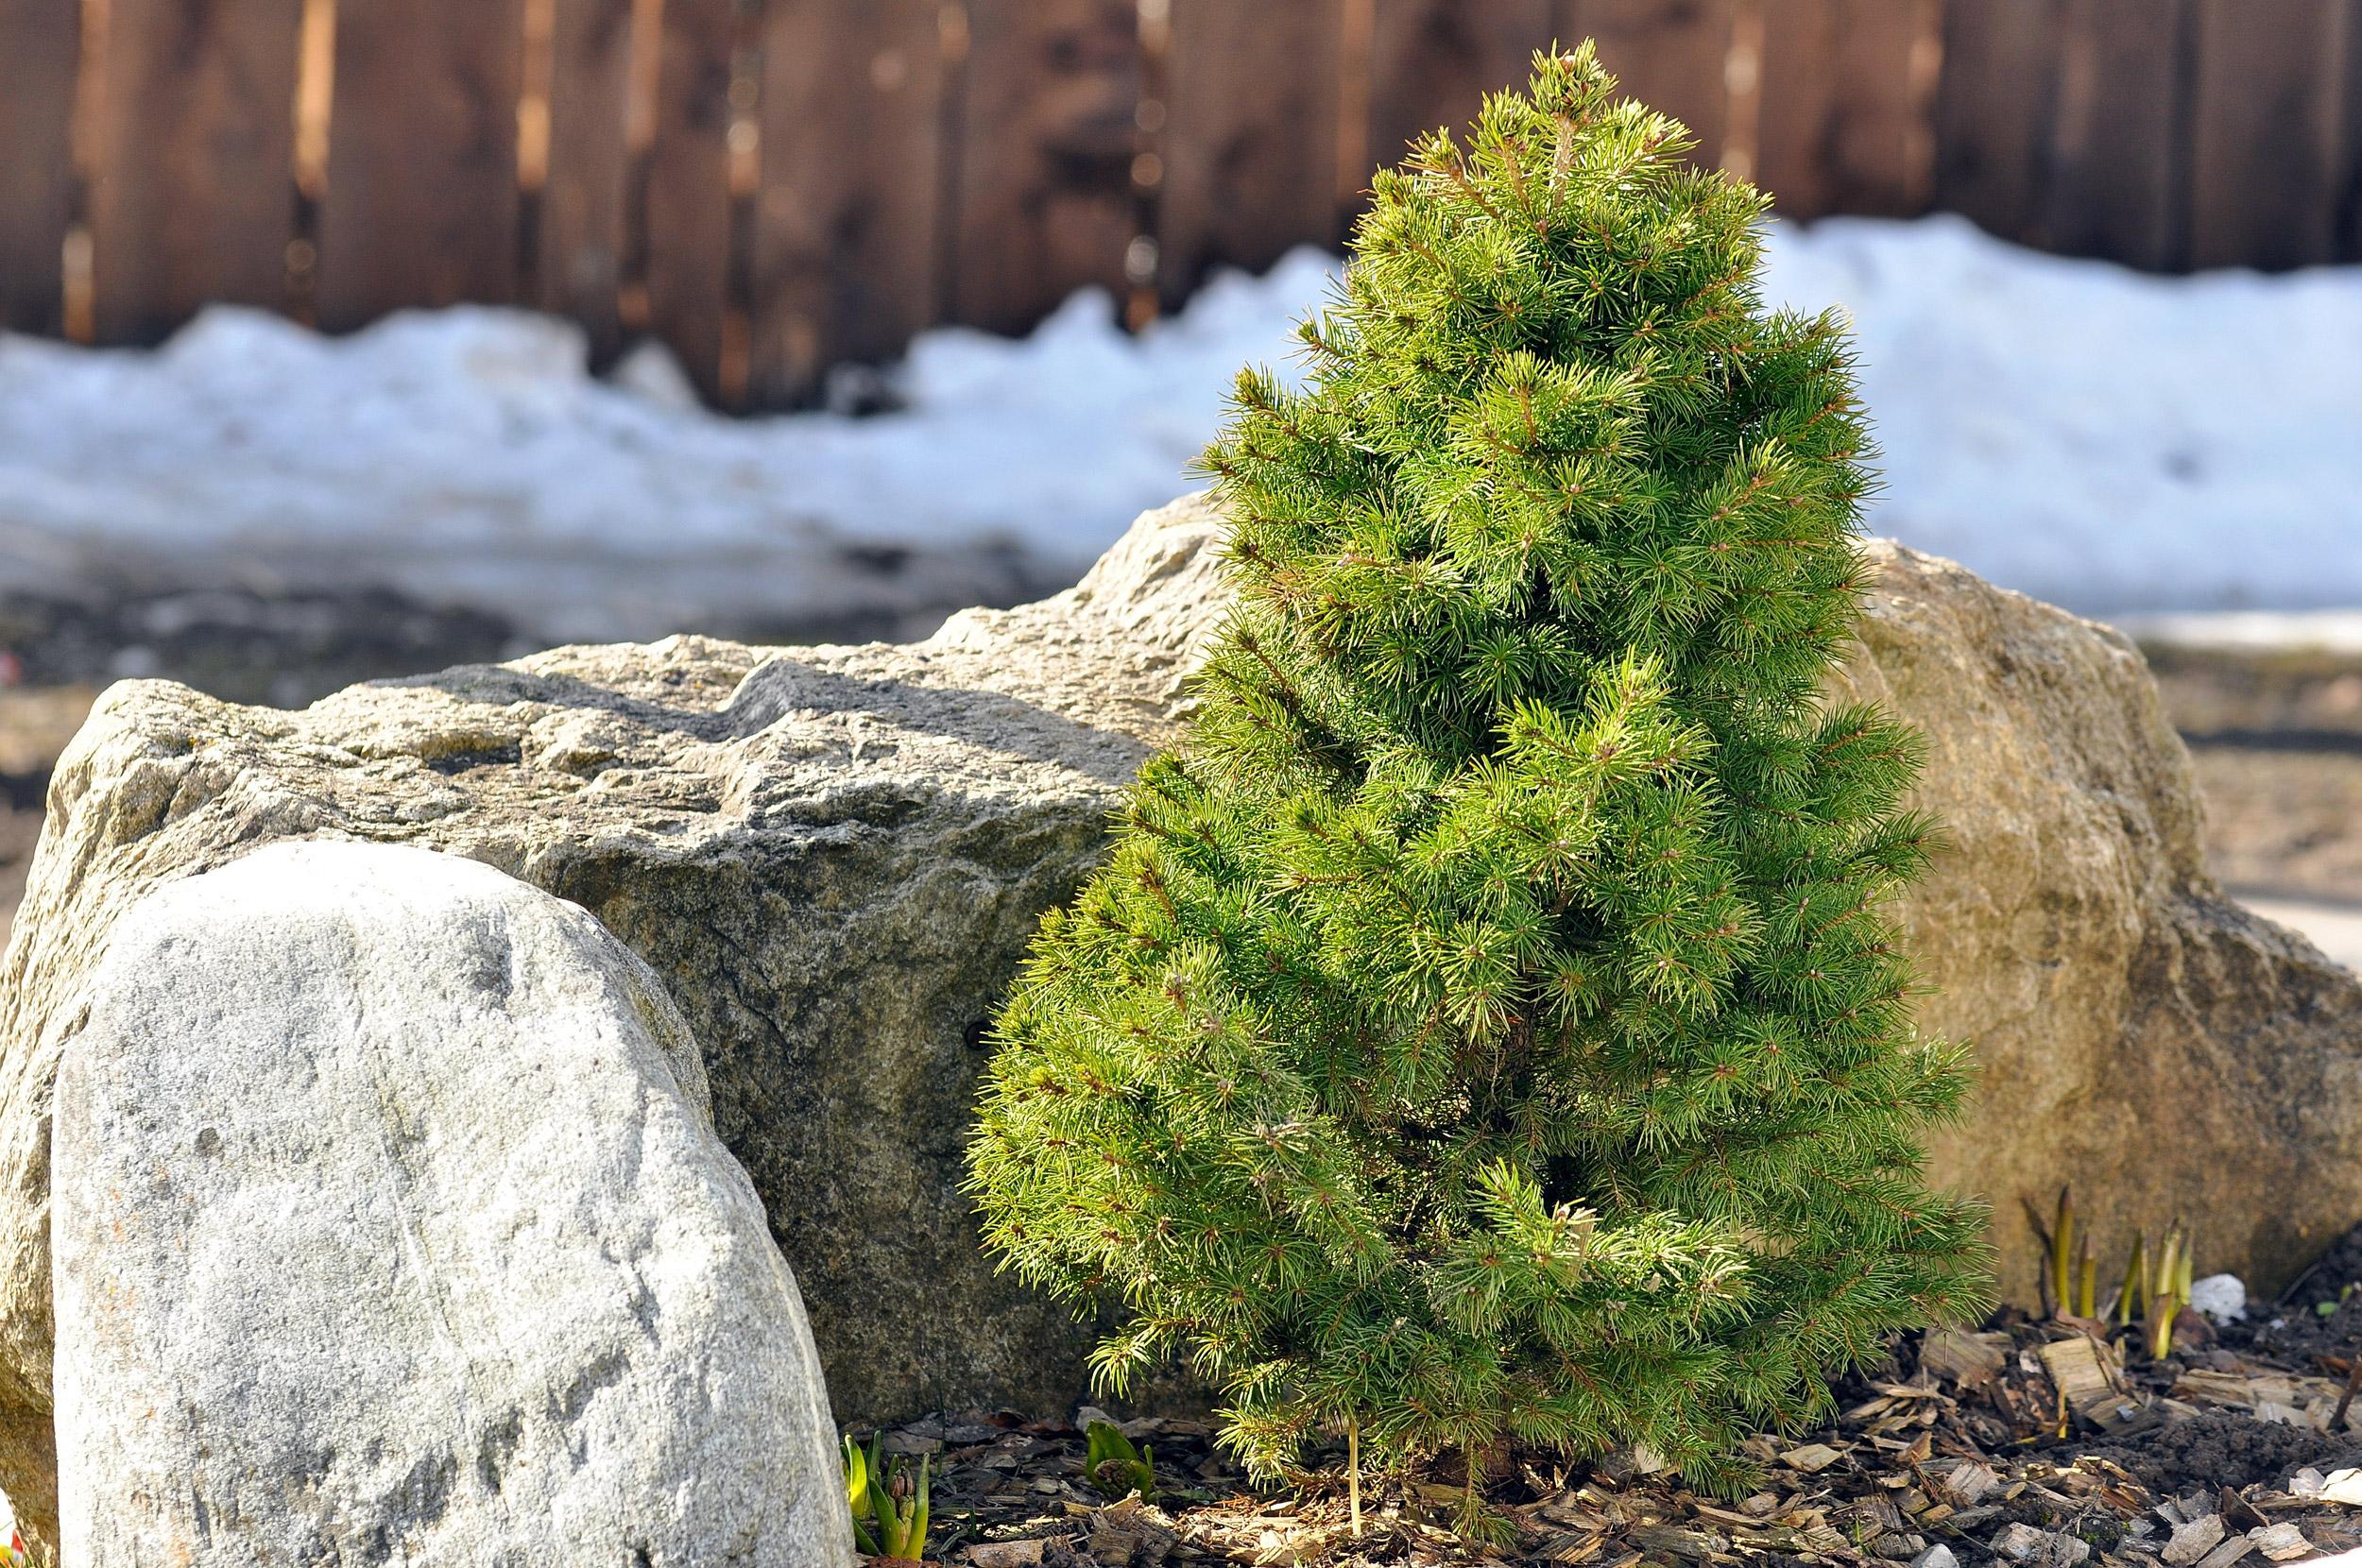 dwarf-fir-tree-in-spring-garden.jpg